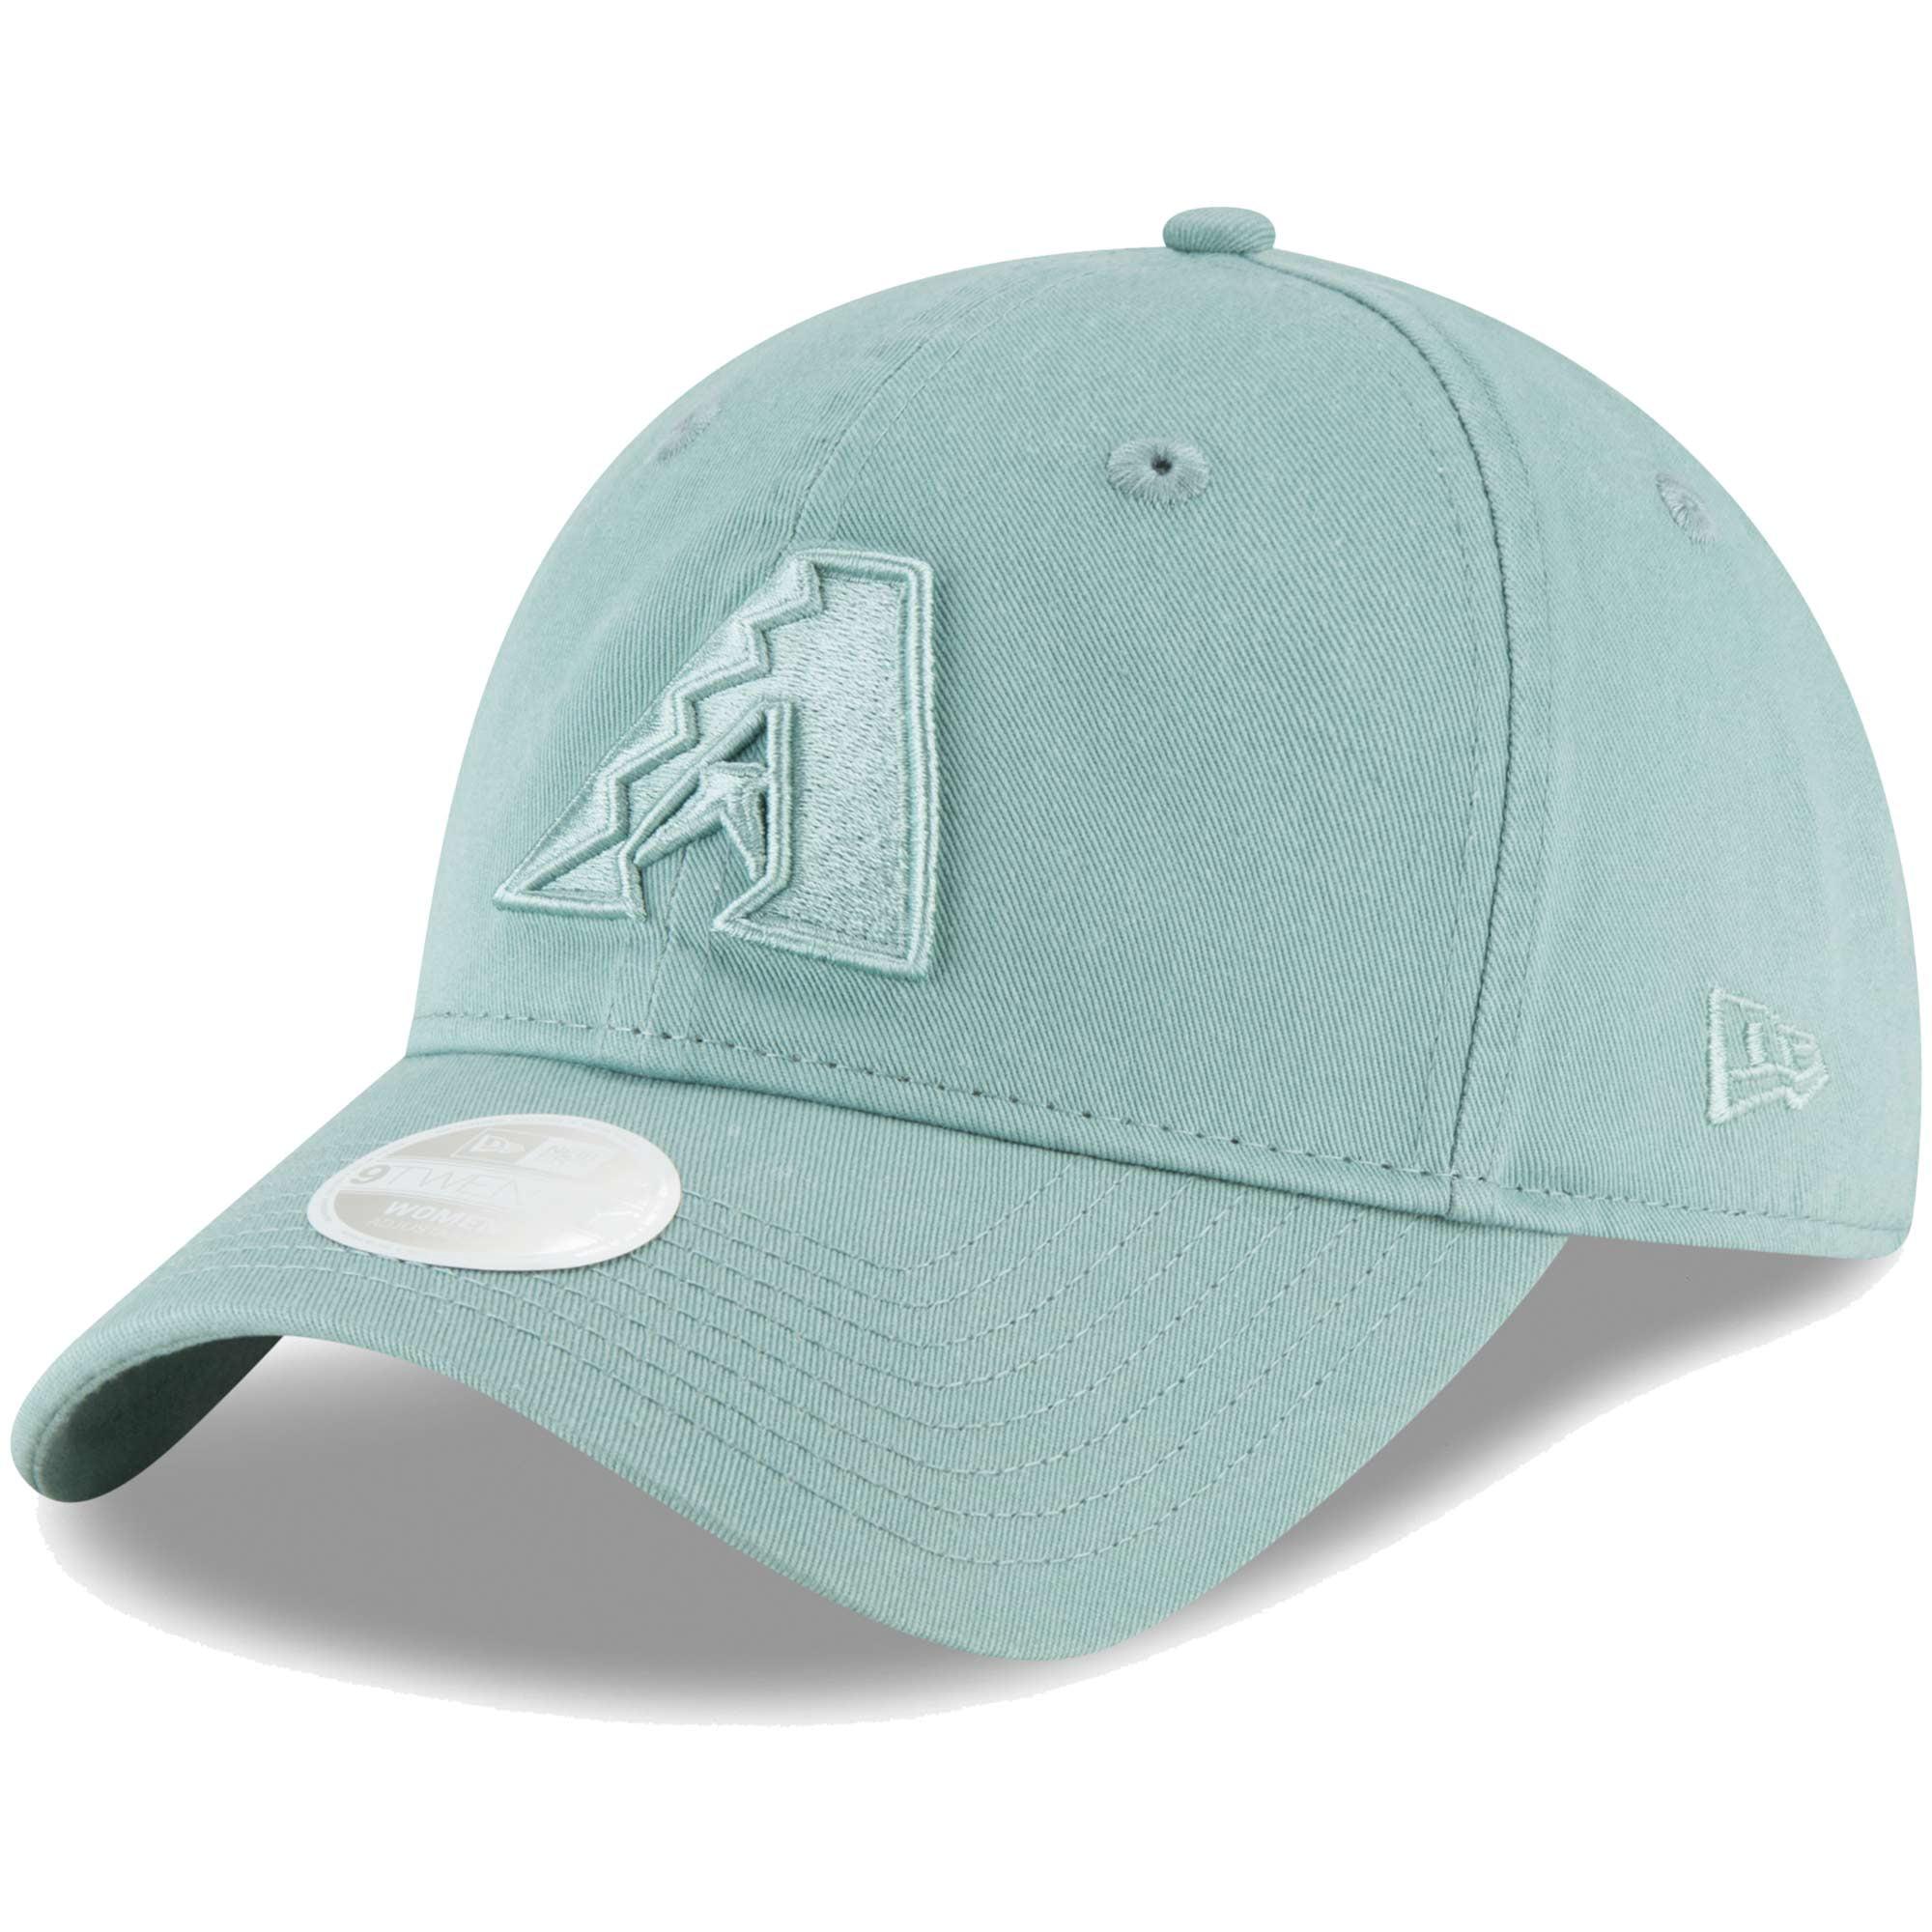 Arizona Diamondbacks New Era Women's Core Classic Twill 9TWENTY Adjustable Hat - Light Blue - OSFA